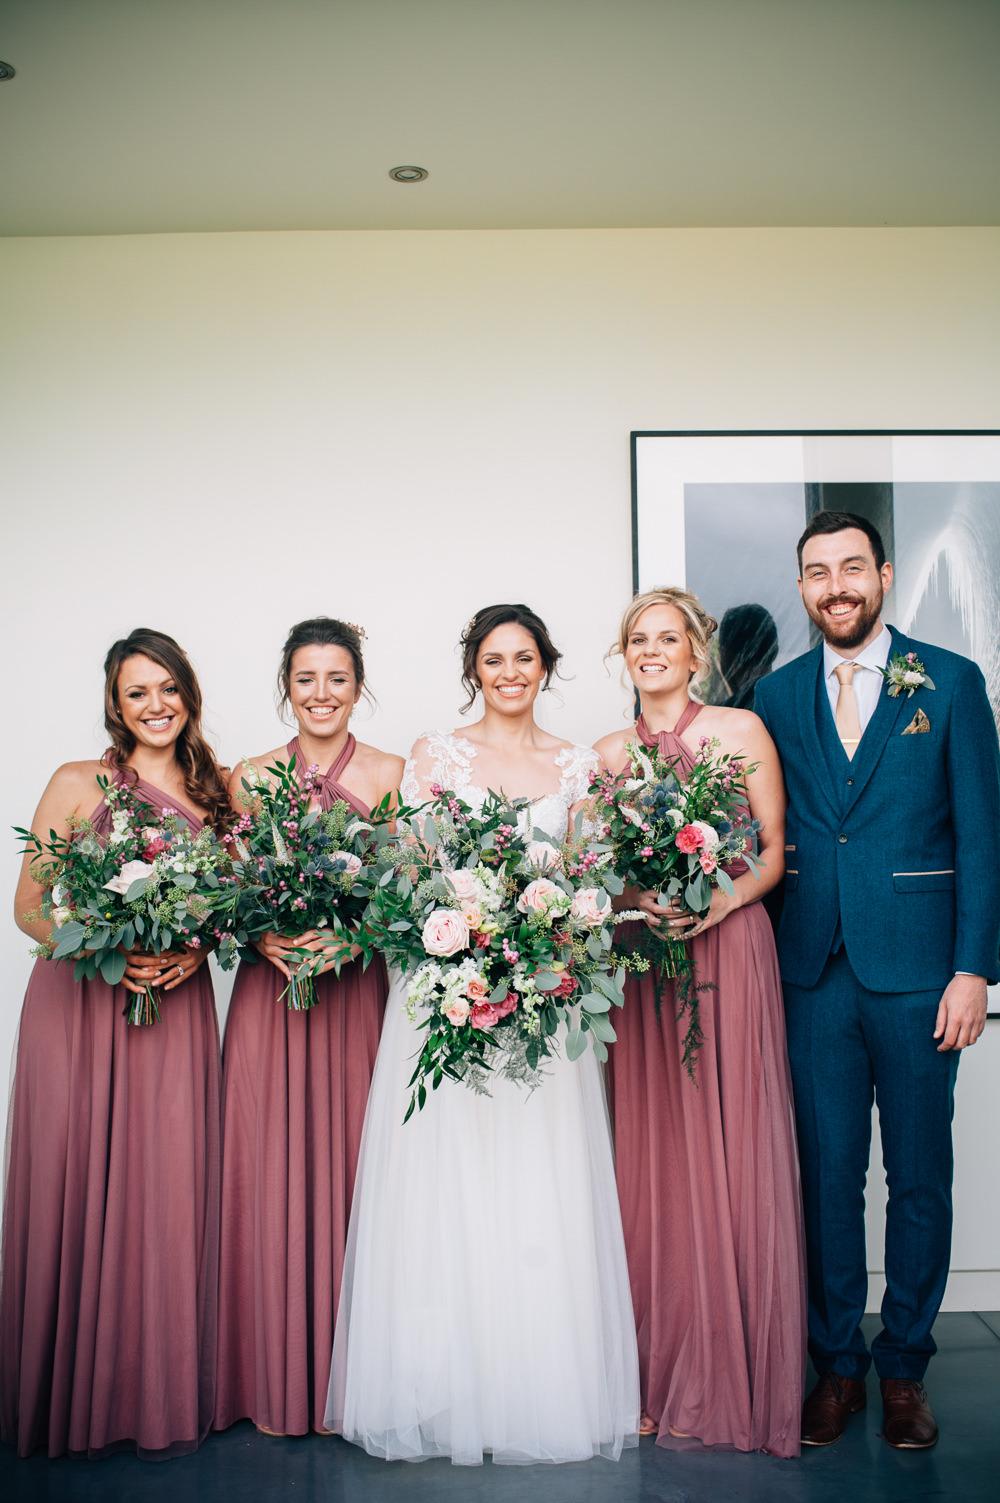 Long Maxi Dusky Pink Bridesmaid Bridesmaids Dress Dresses Multiway Cripps Barn Wedding Isobel Murphy Photography